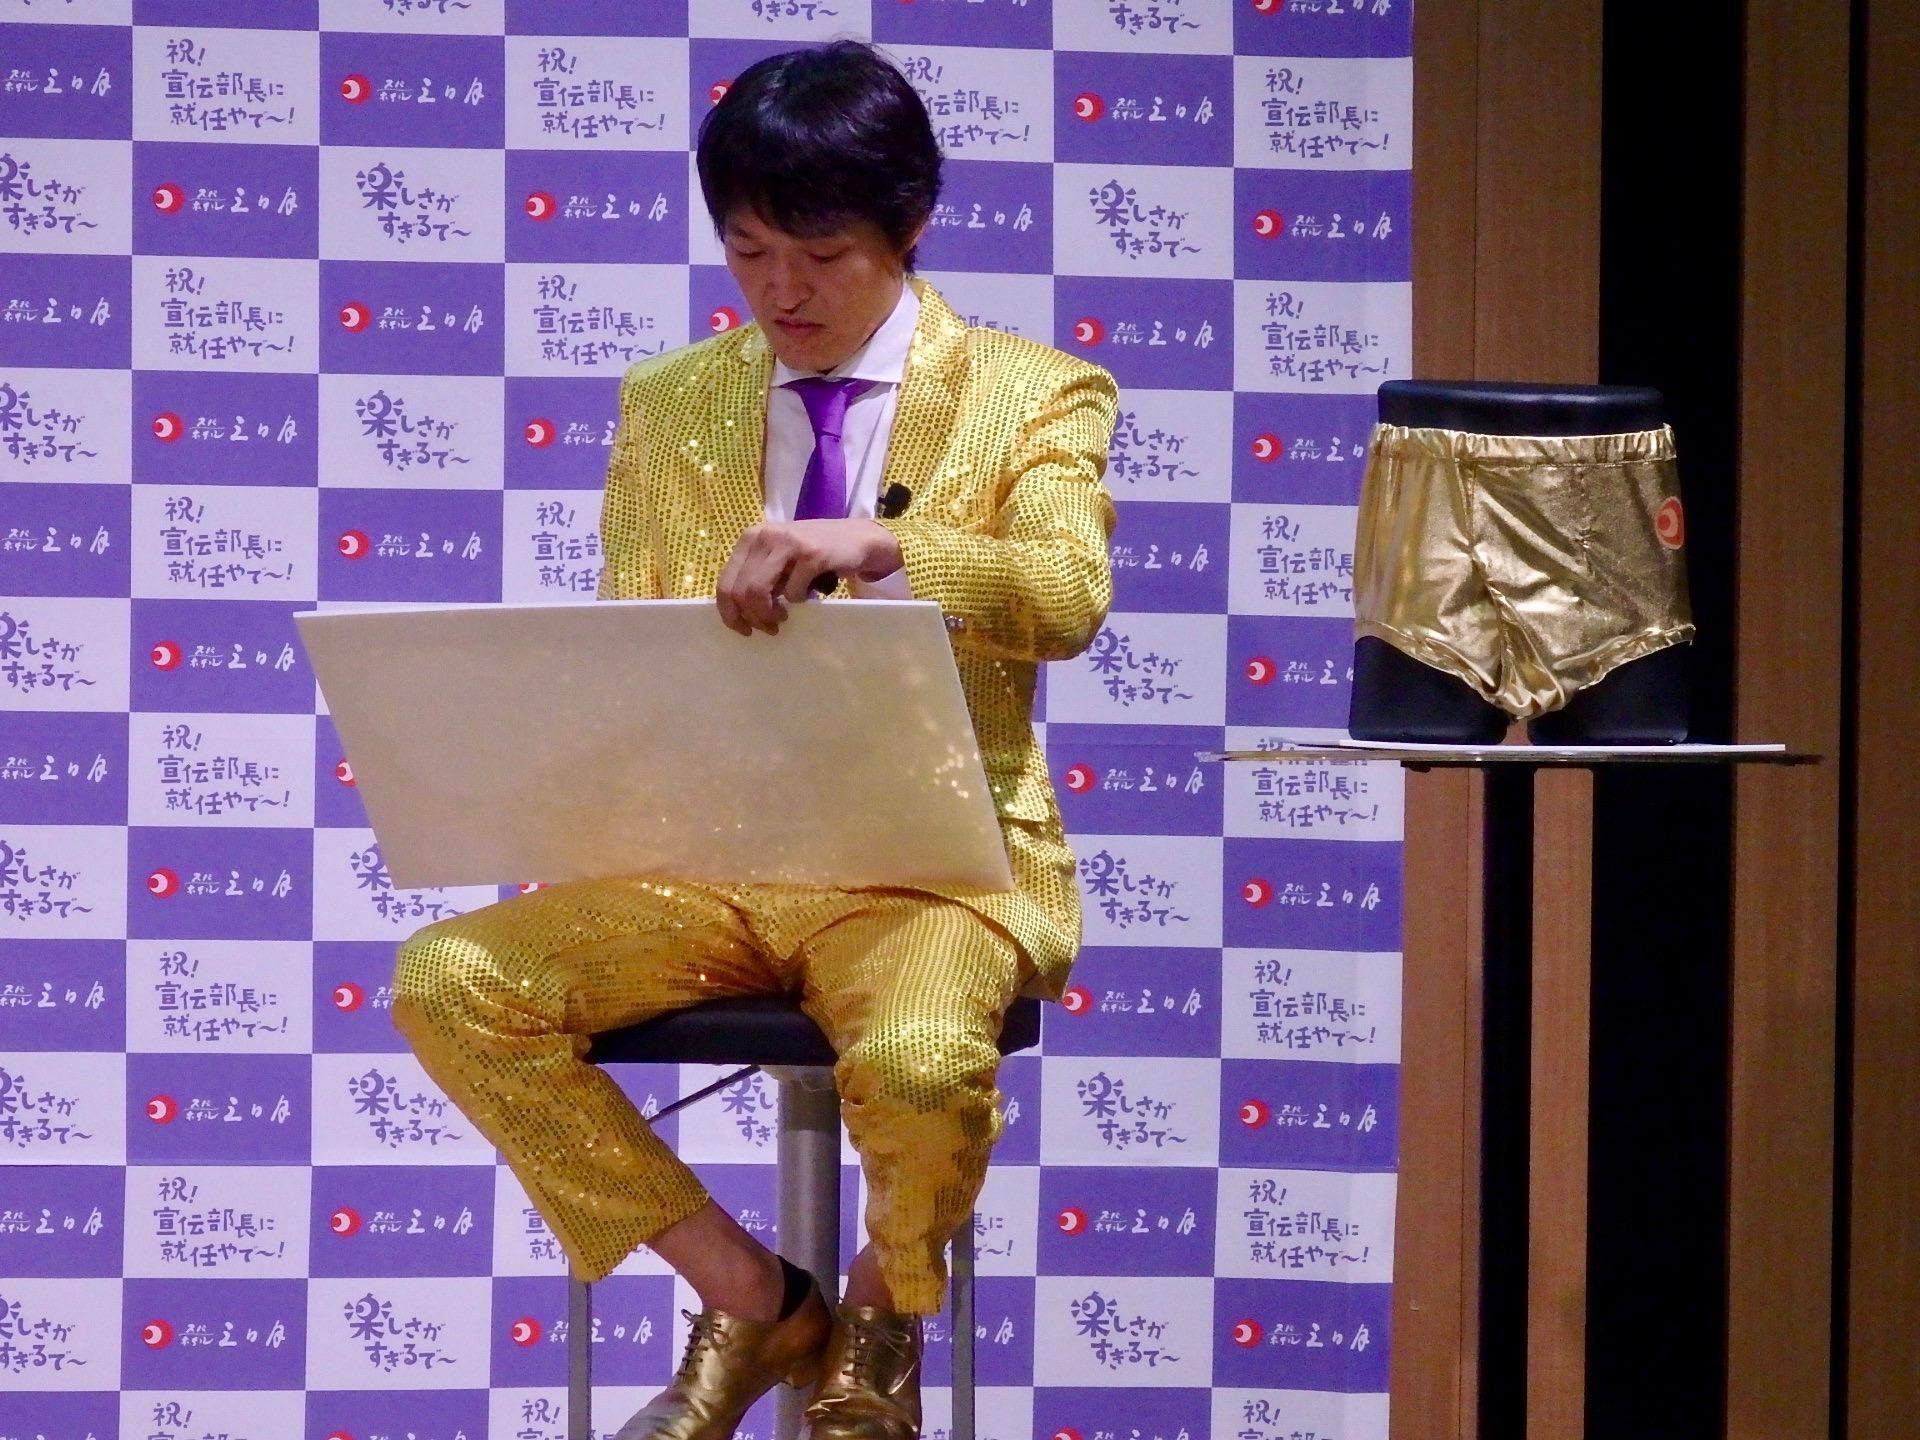 http://news.yoshimoto.co.jp/20180628202812-ba1a96930fe431f3d5ceb74f23e9ea9658d9f1ba.jpg